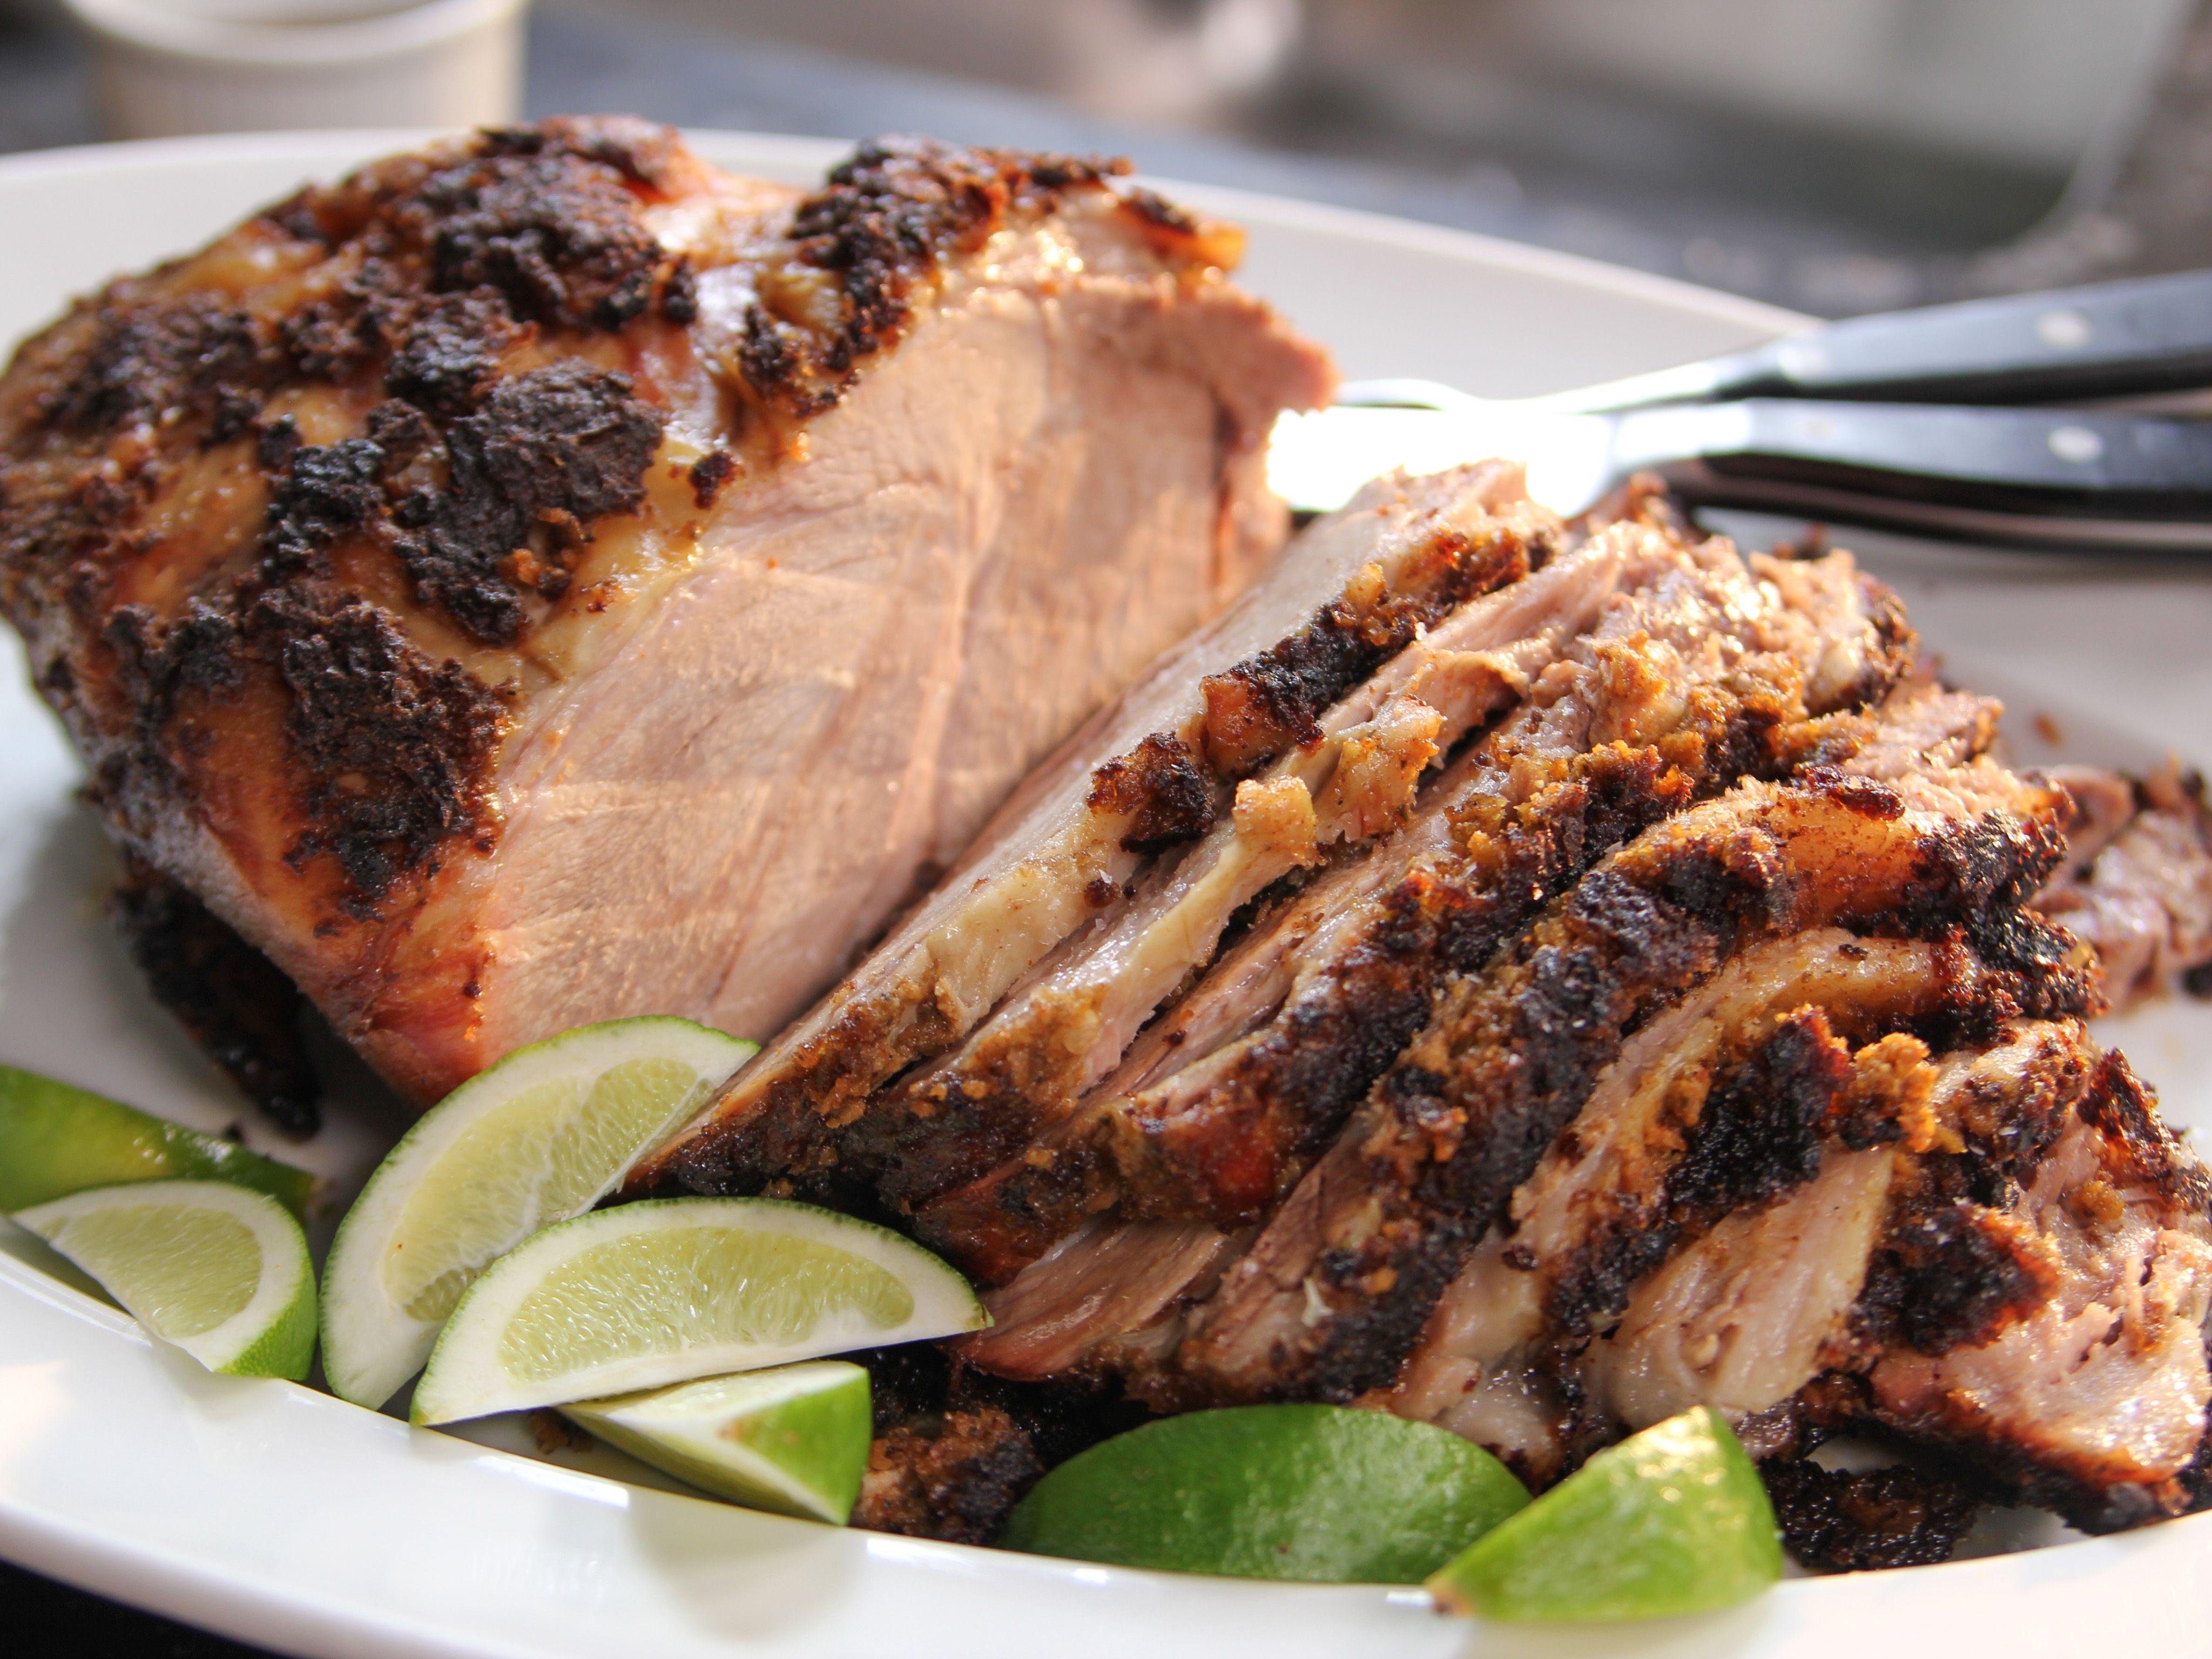 Slow Roasted Spiced Pork Recipe Food Network Recipes Pork Recipes Recipes